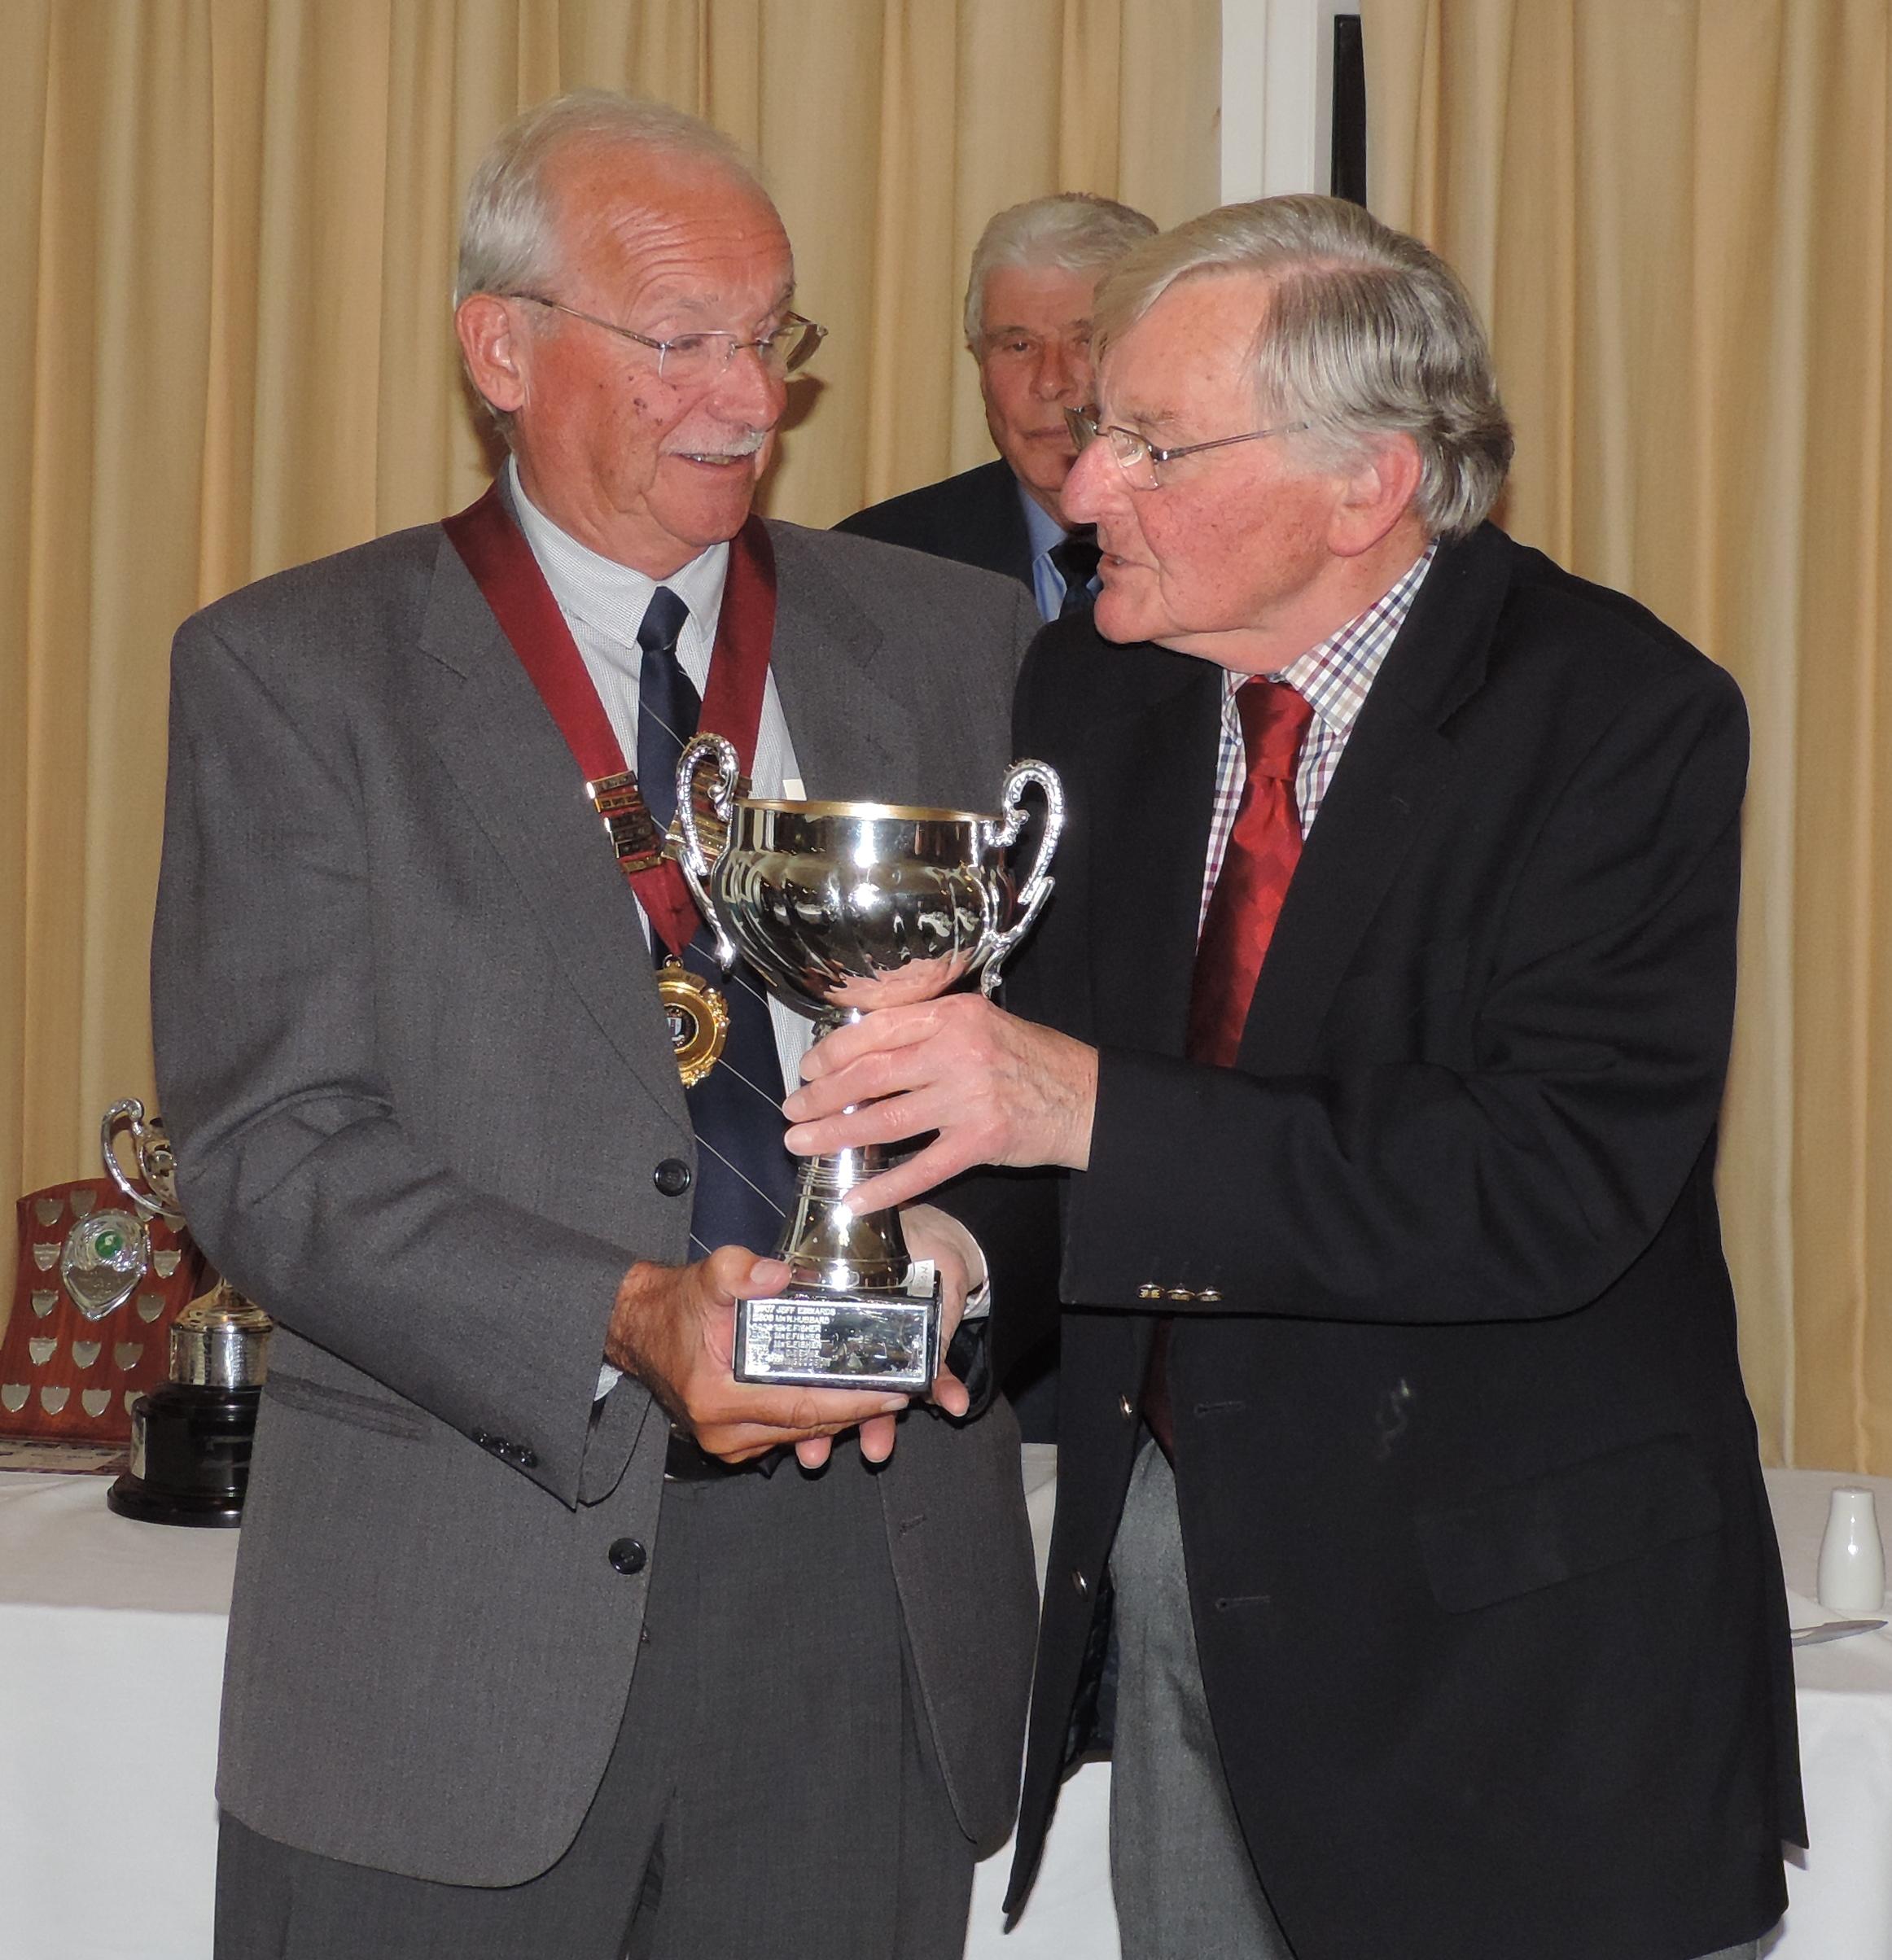 Richards Cup Winner